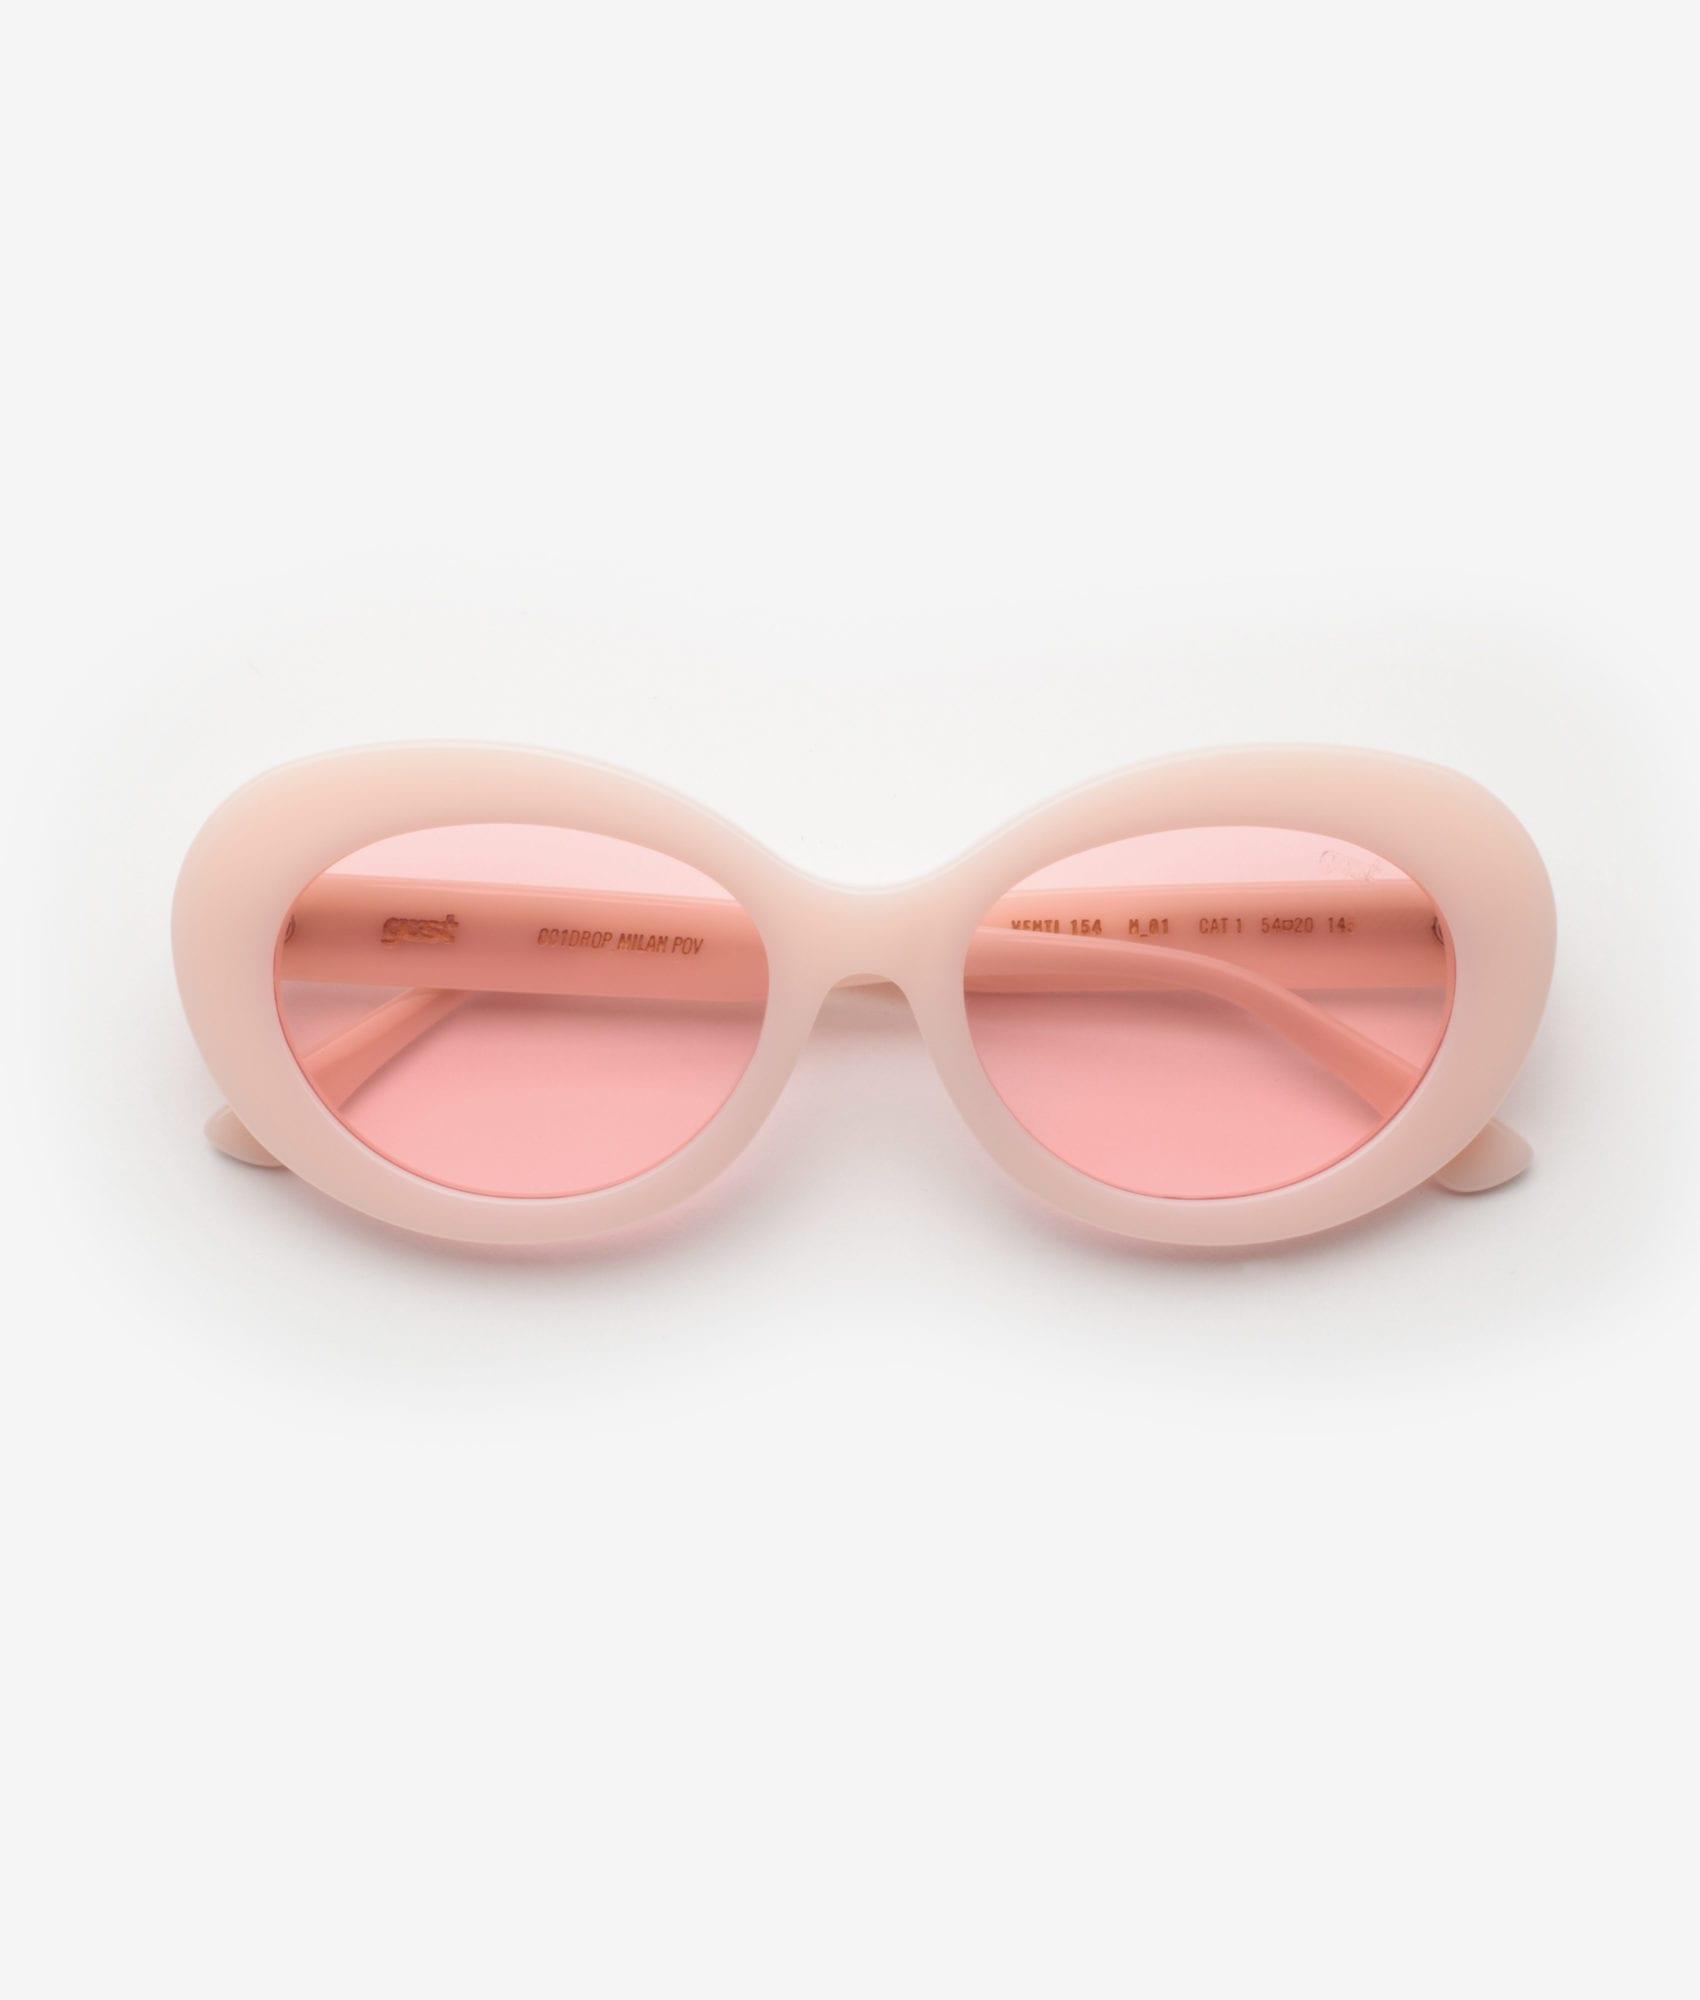 VENTI 154 Pink Gast Sunglasses